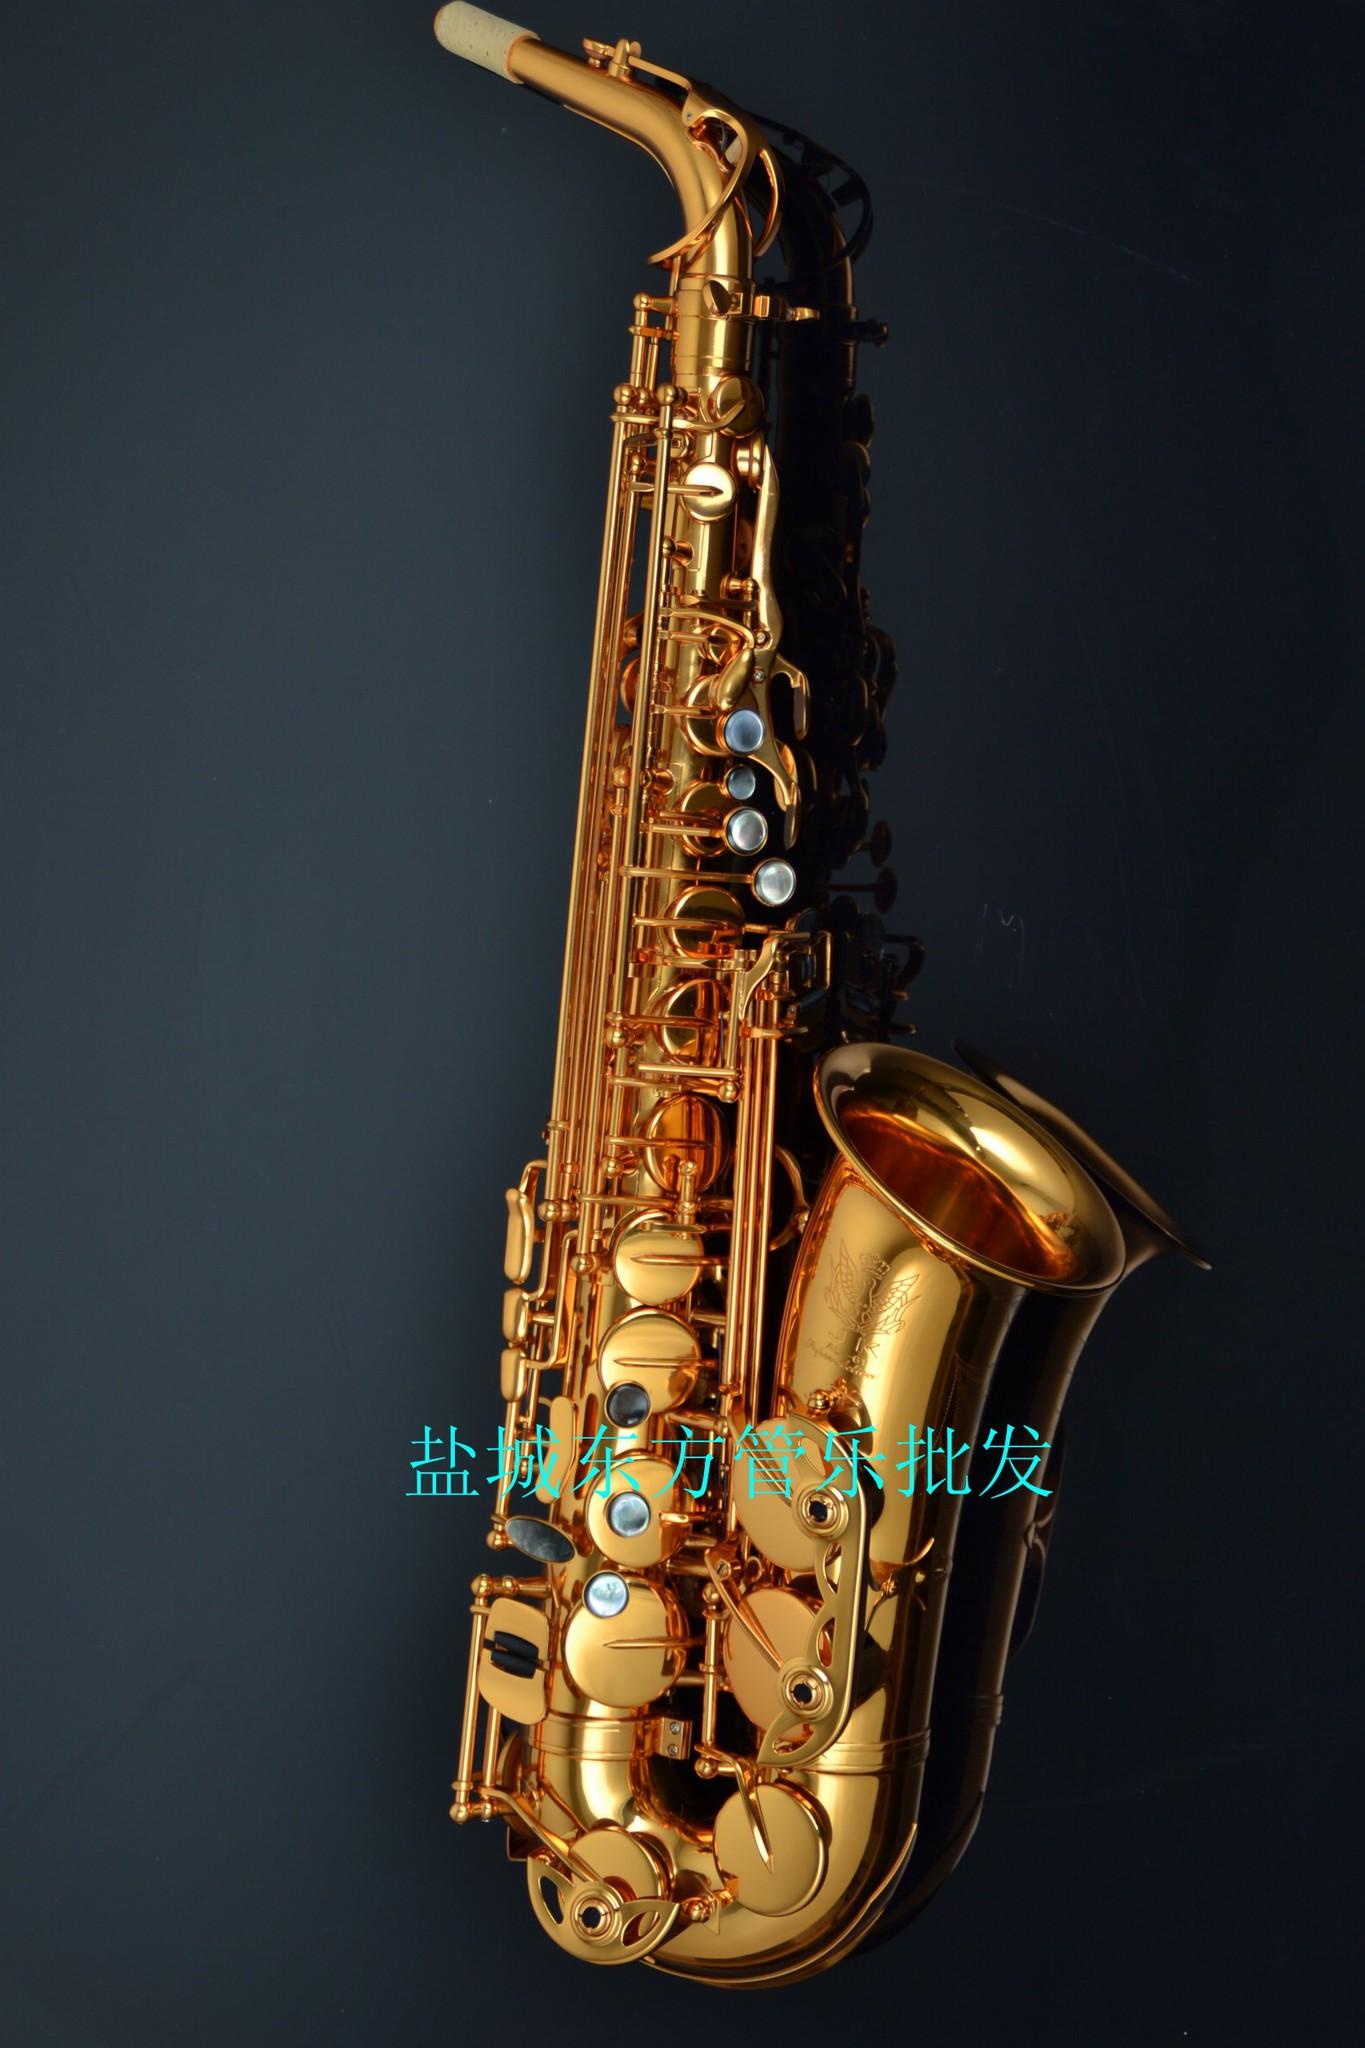 Саксофон 台湾  原产/原装   jk 62 型 高档 中音 be调  萨克斯 超一流品质